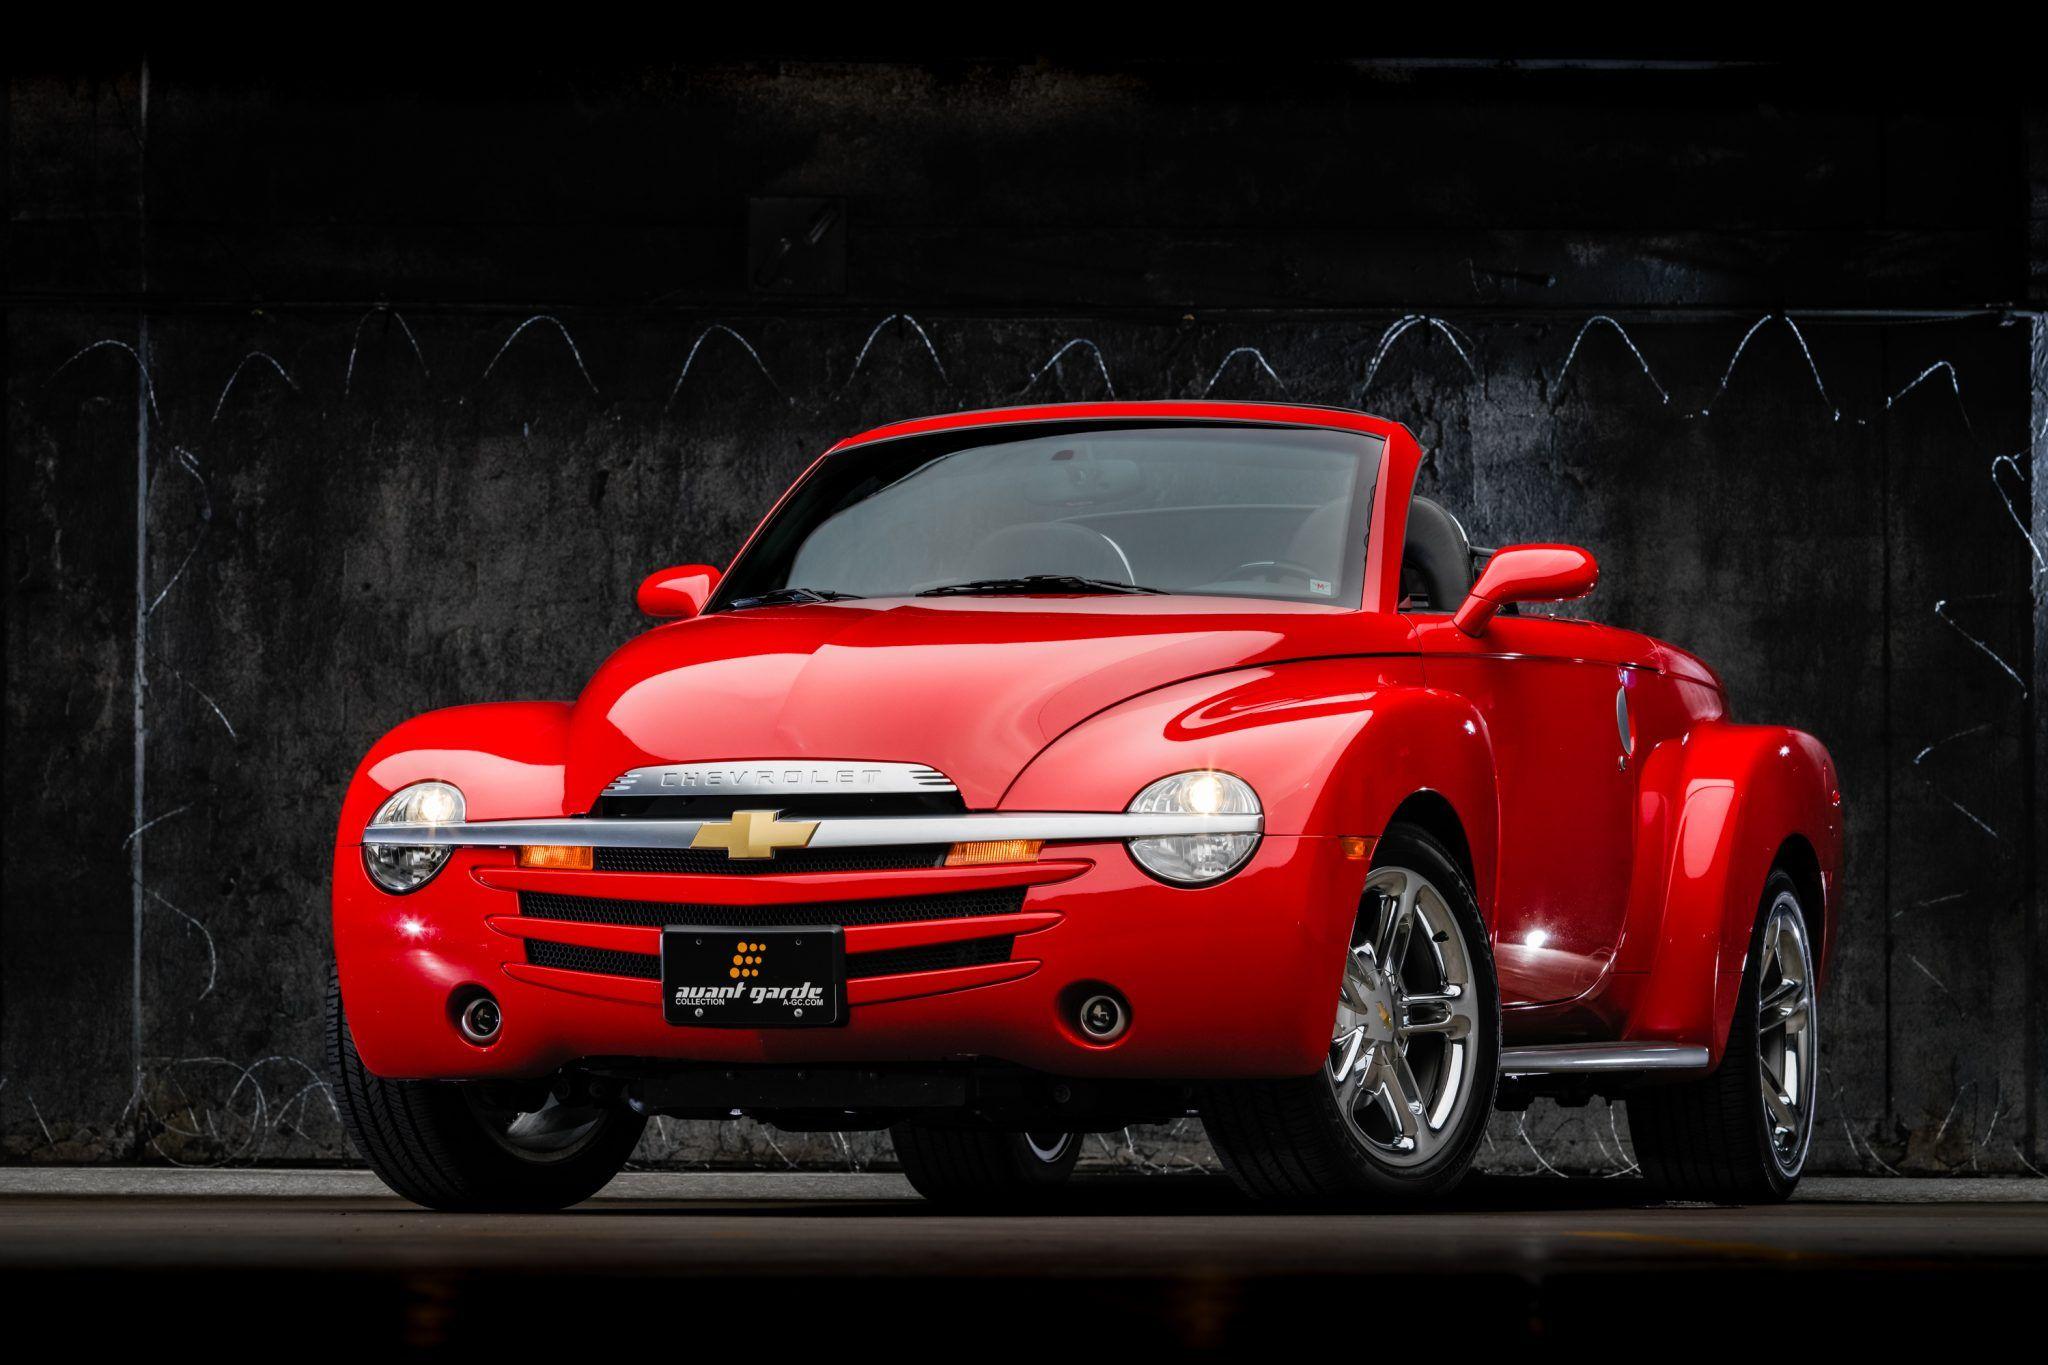 2k Mile 2005 Chevrolet Ssr 6 Speed Chevrolet Ssr Chevrolet Fiat 850 Sport Coupé